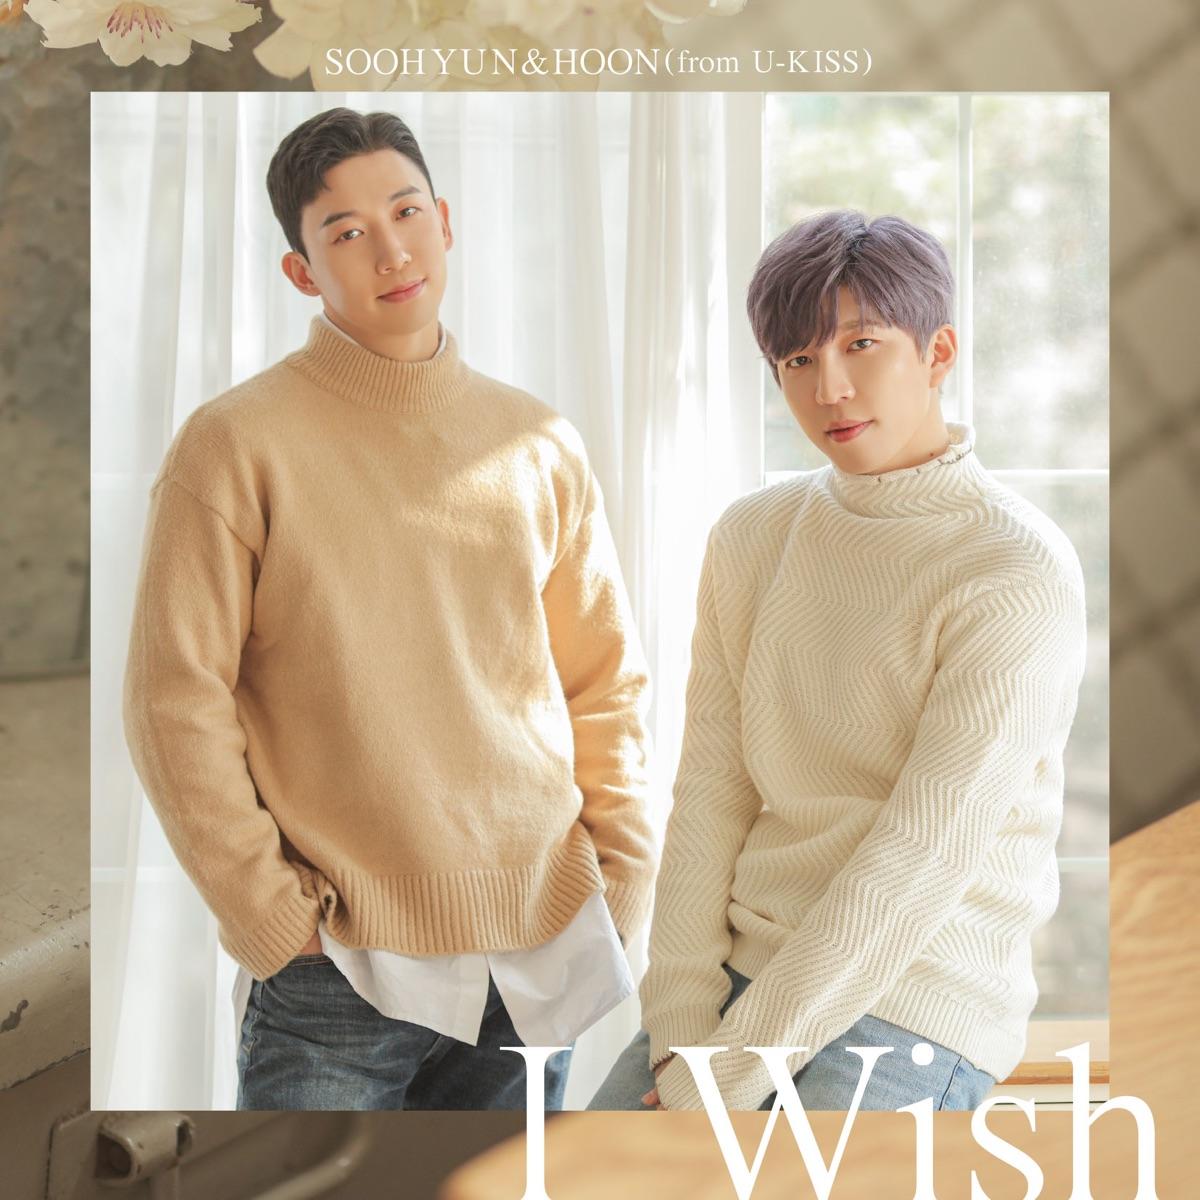 『SOOHYUN&HOON(from U-KISS) - I Wish・・・Japanese Version』収録の『I Wish』ジャケット